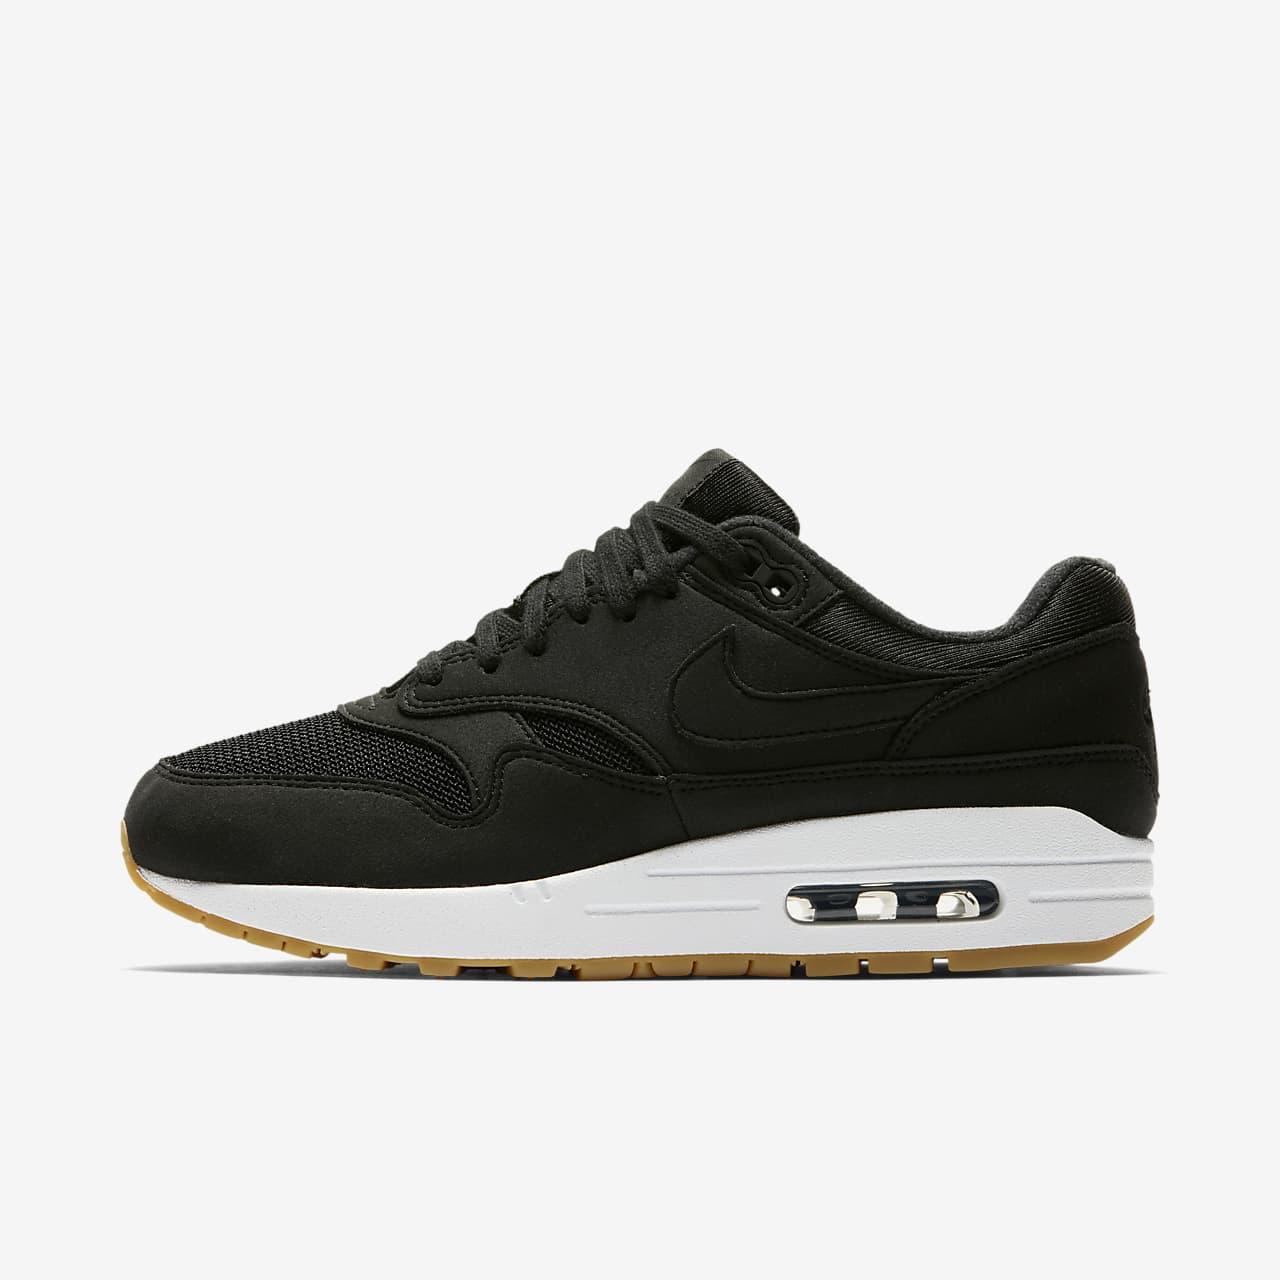 Nike Air Max 1 Women's Shoes